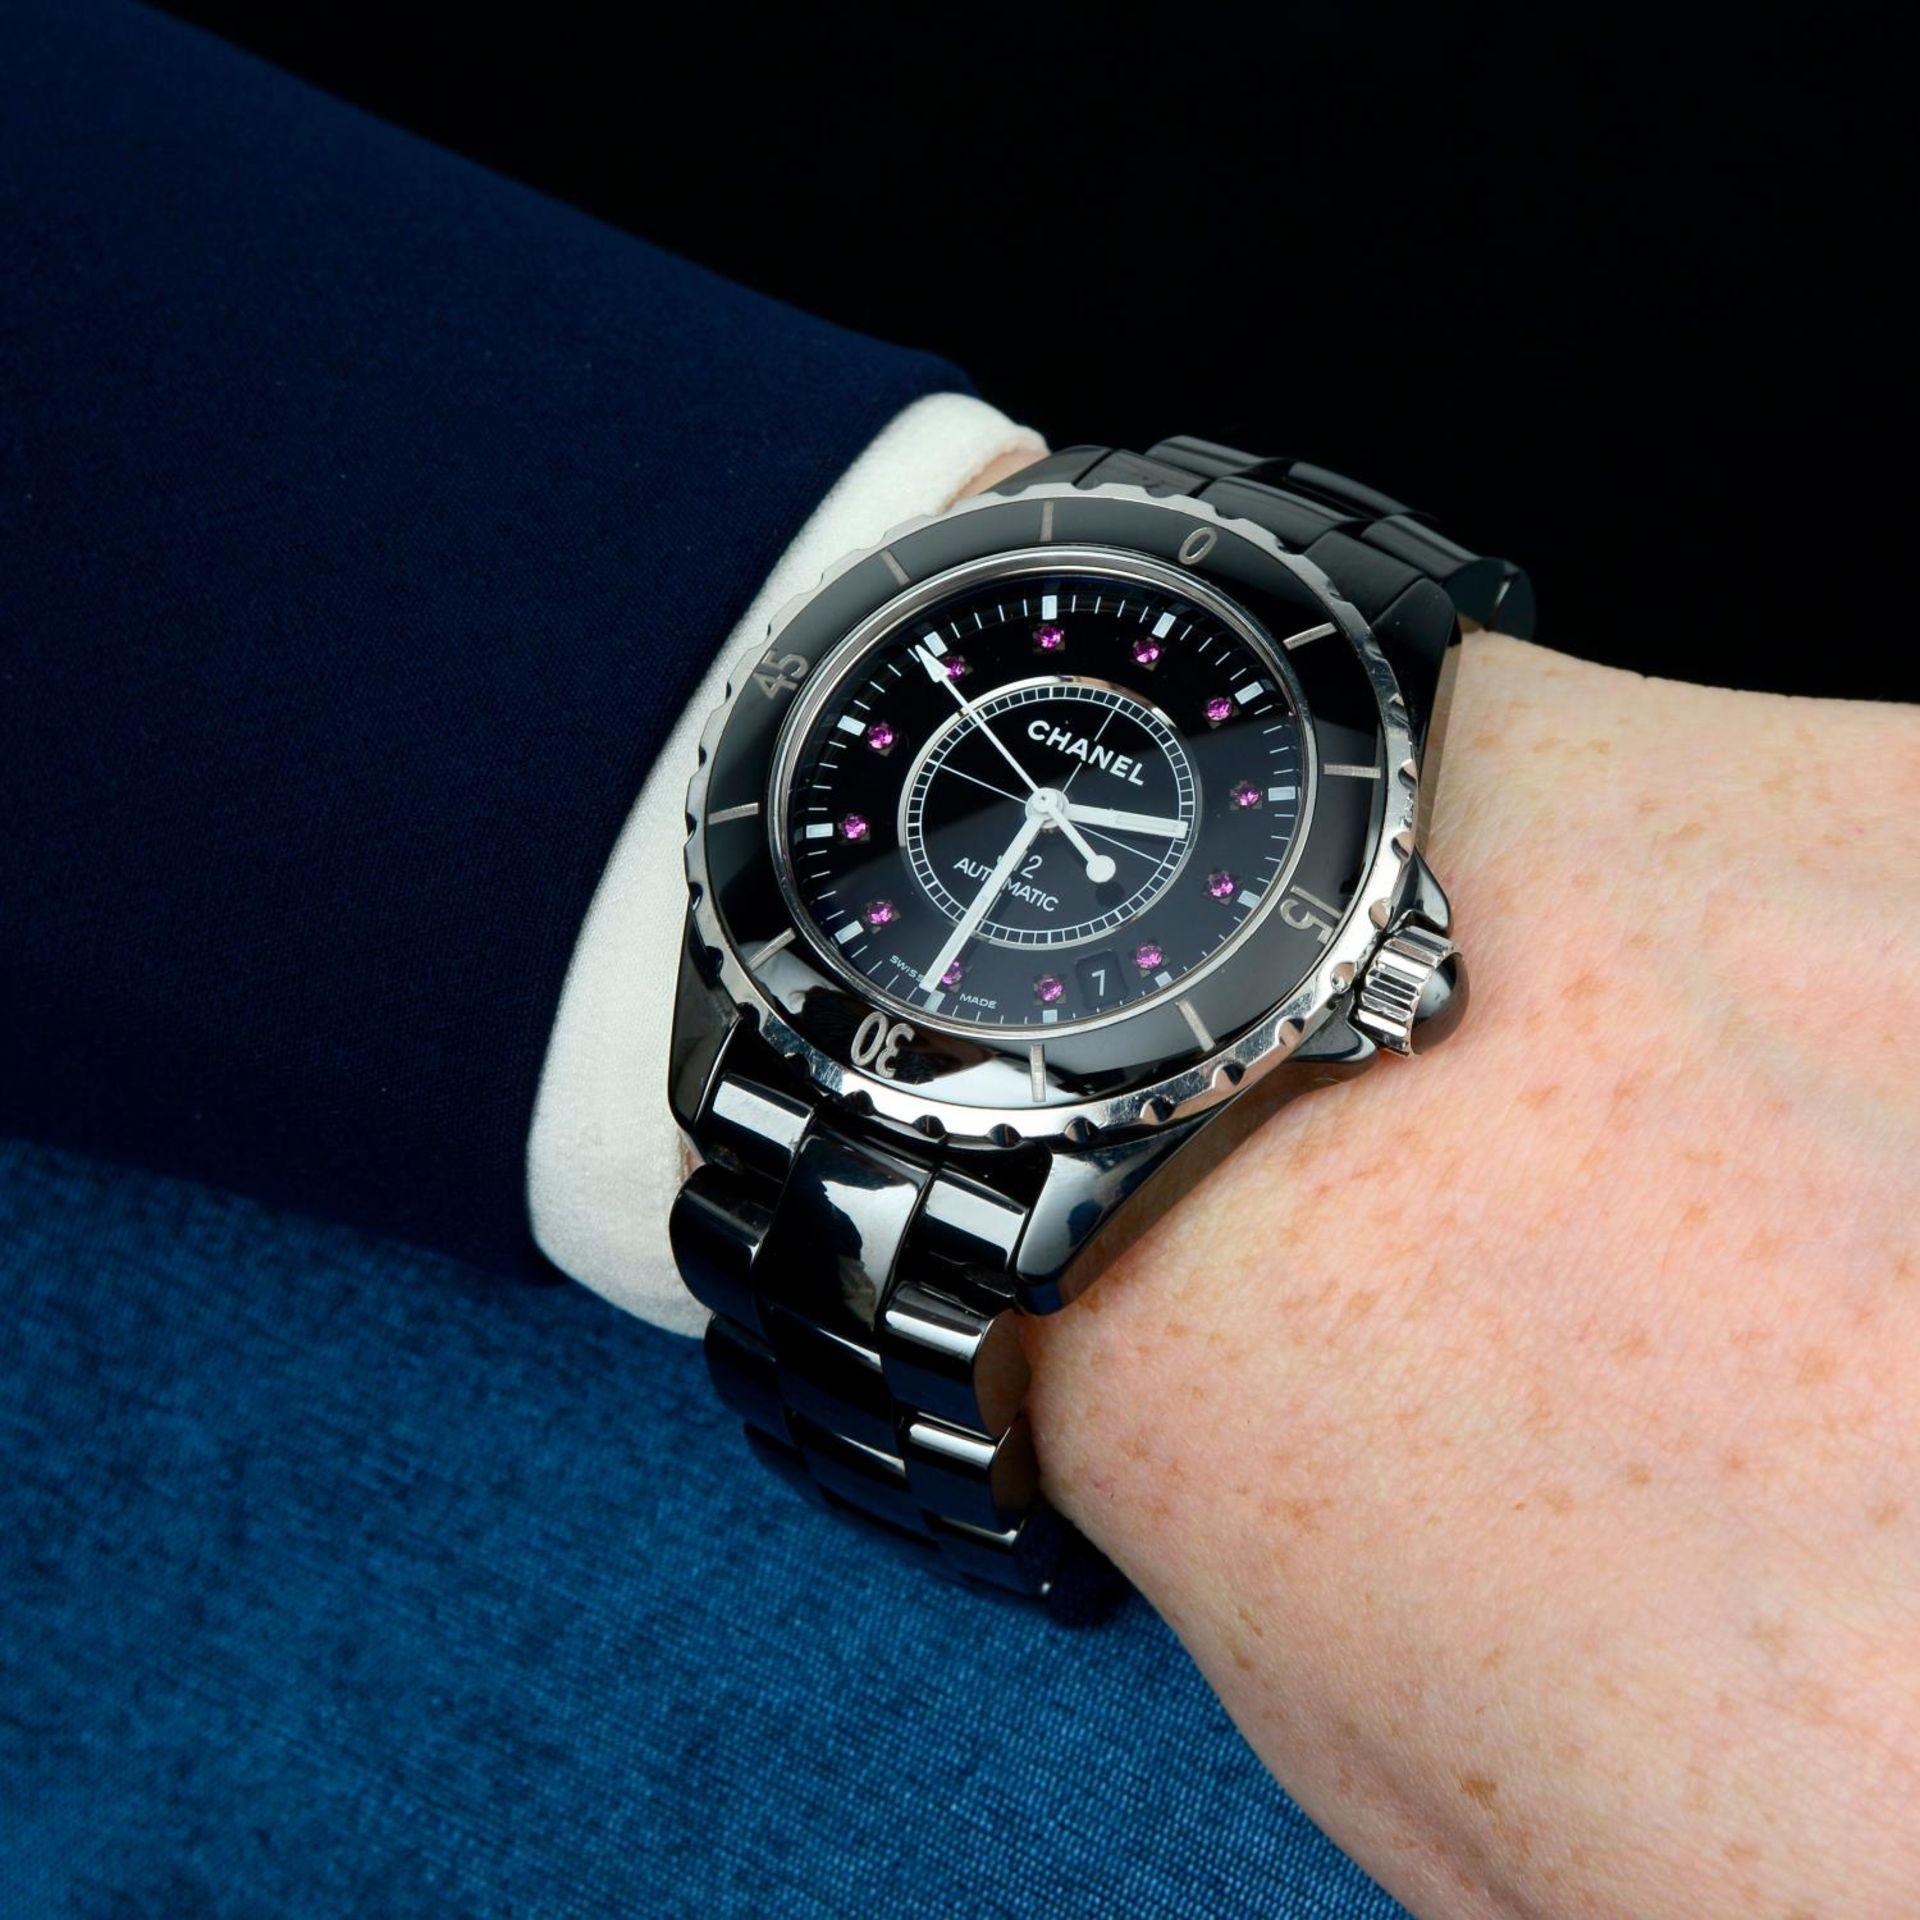 CHANEL - a J12 bracelet watch. - Bild 3 aus 5